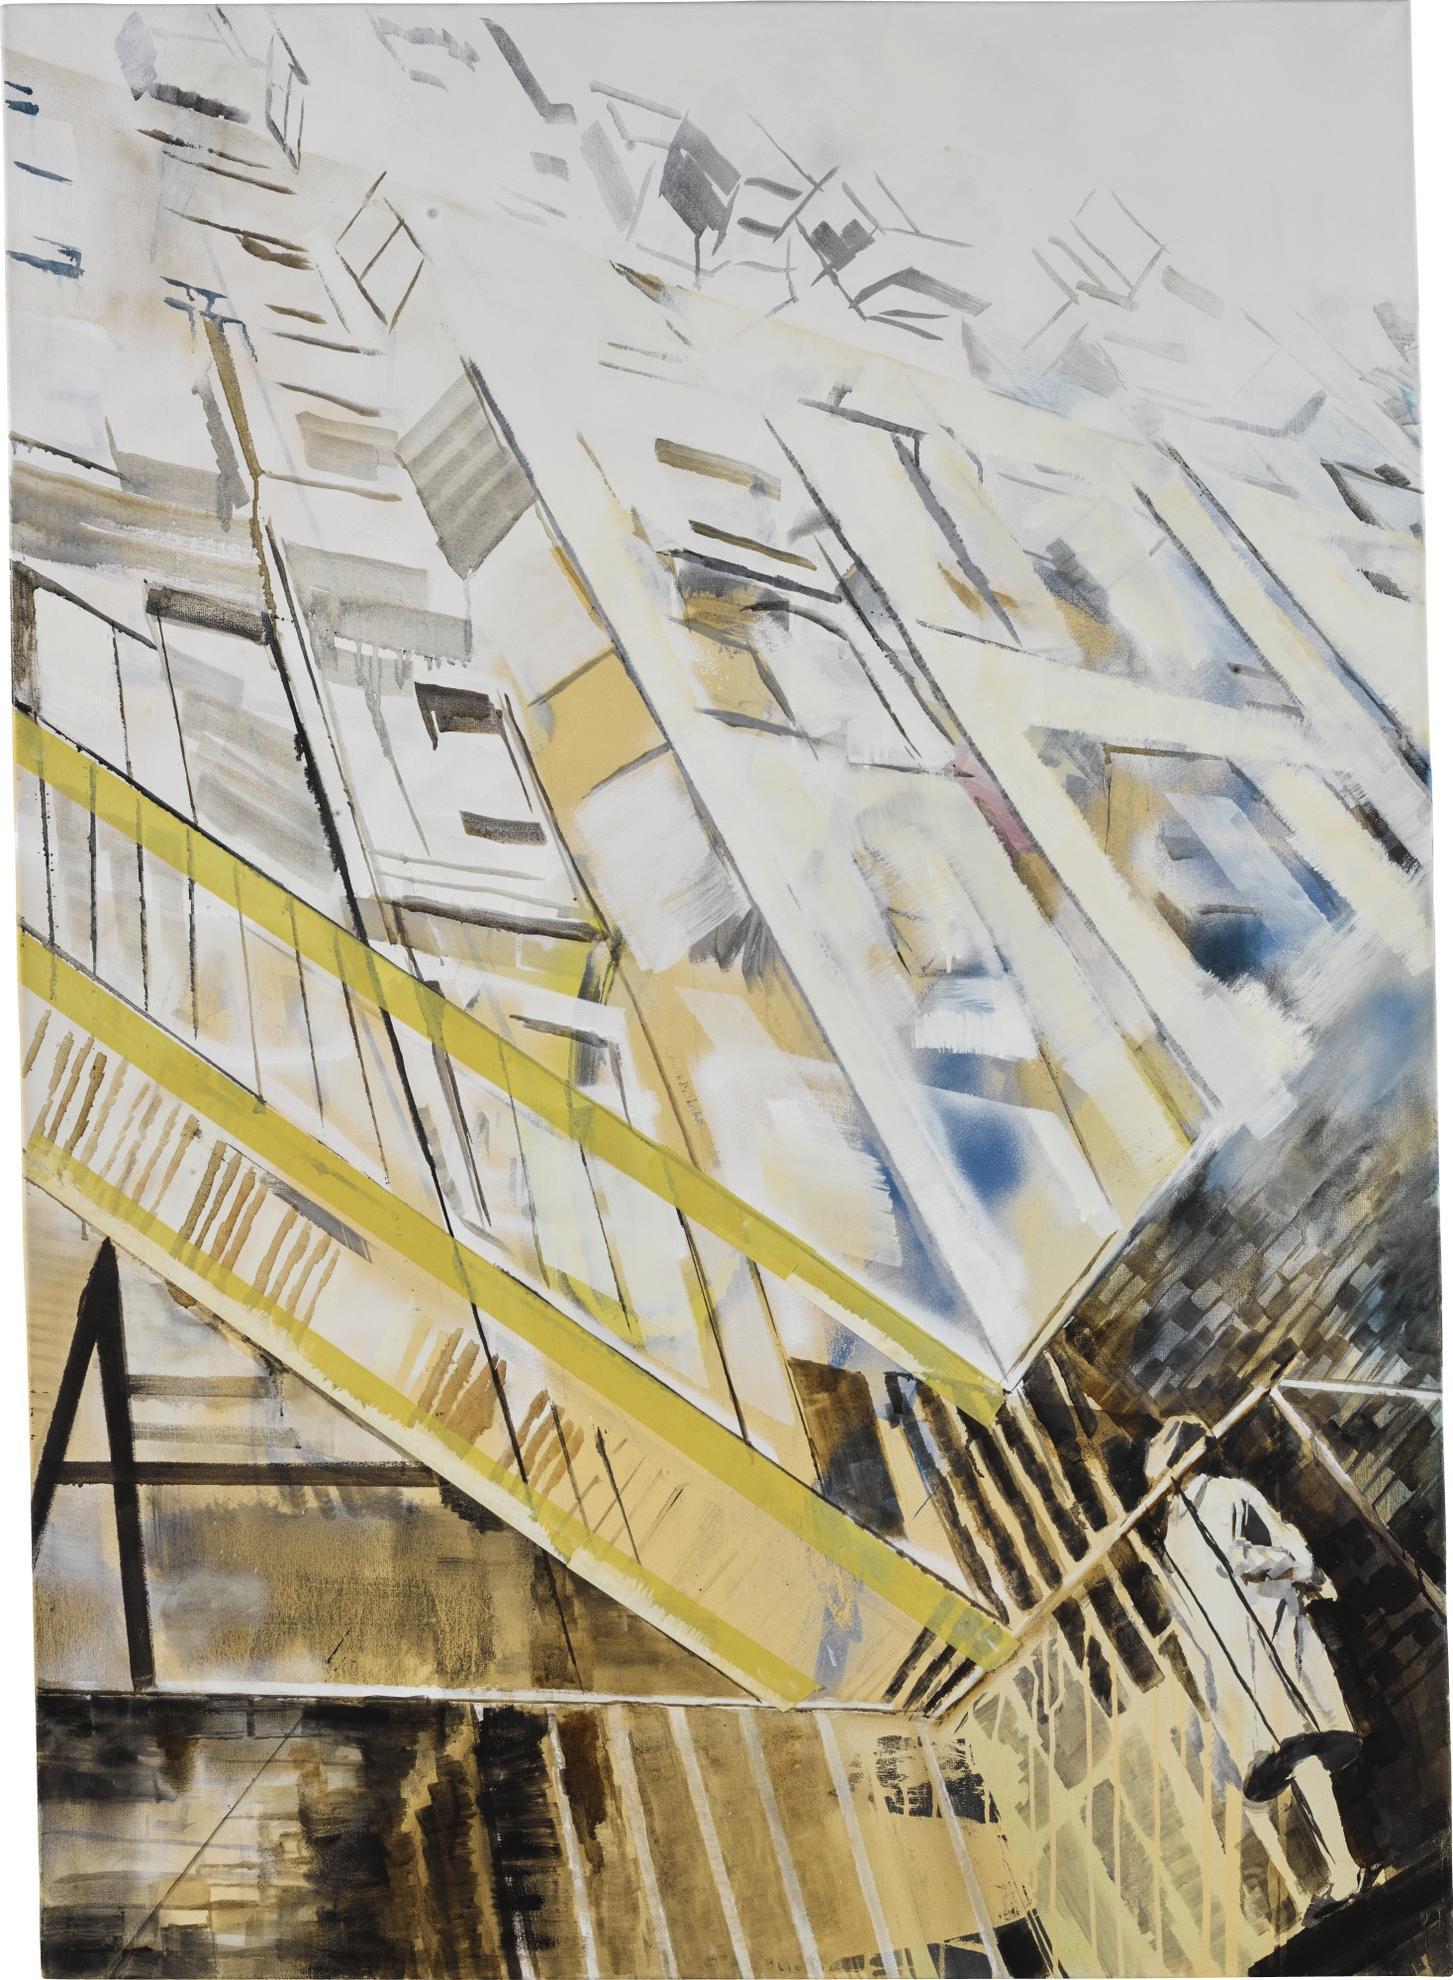 Paulina Olowska-Untitled-2003